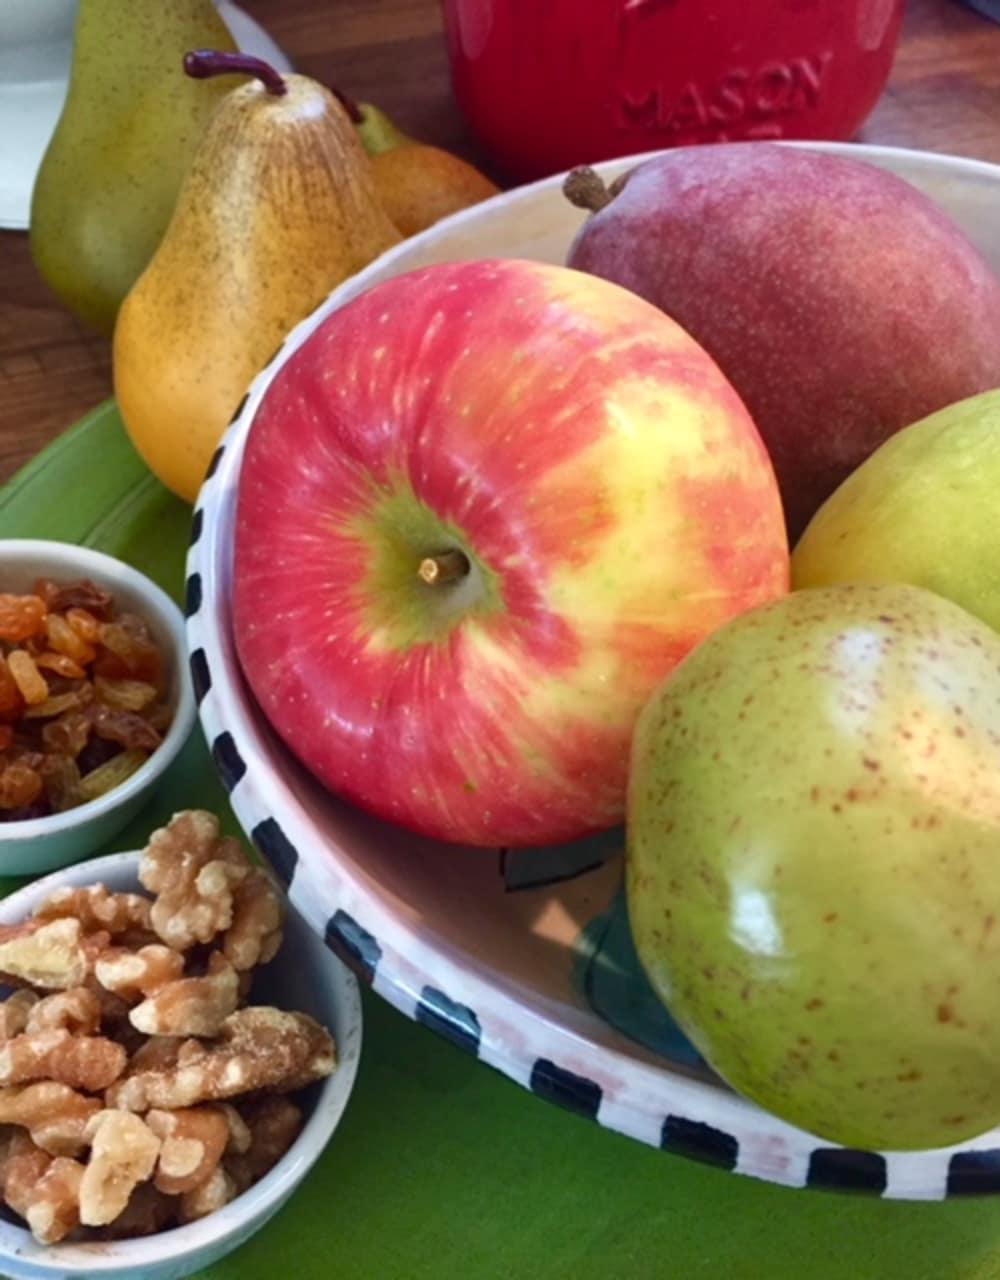 Apple and Pear Season!